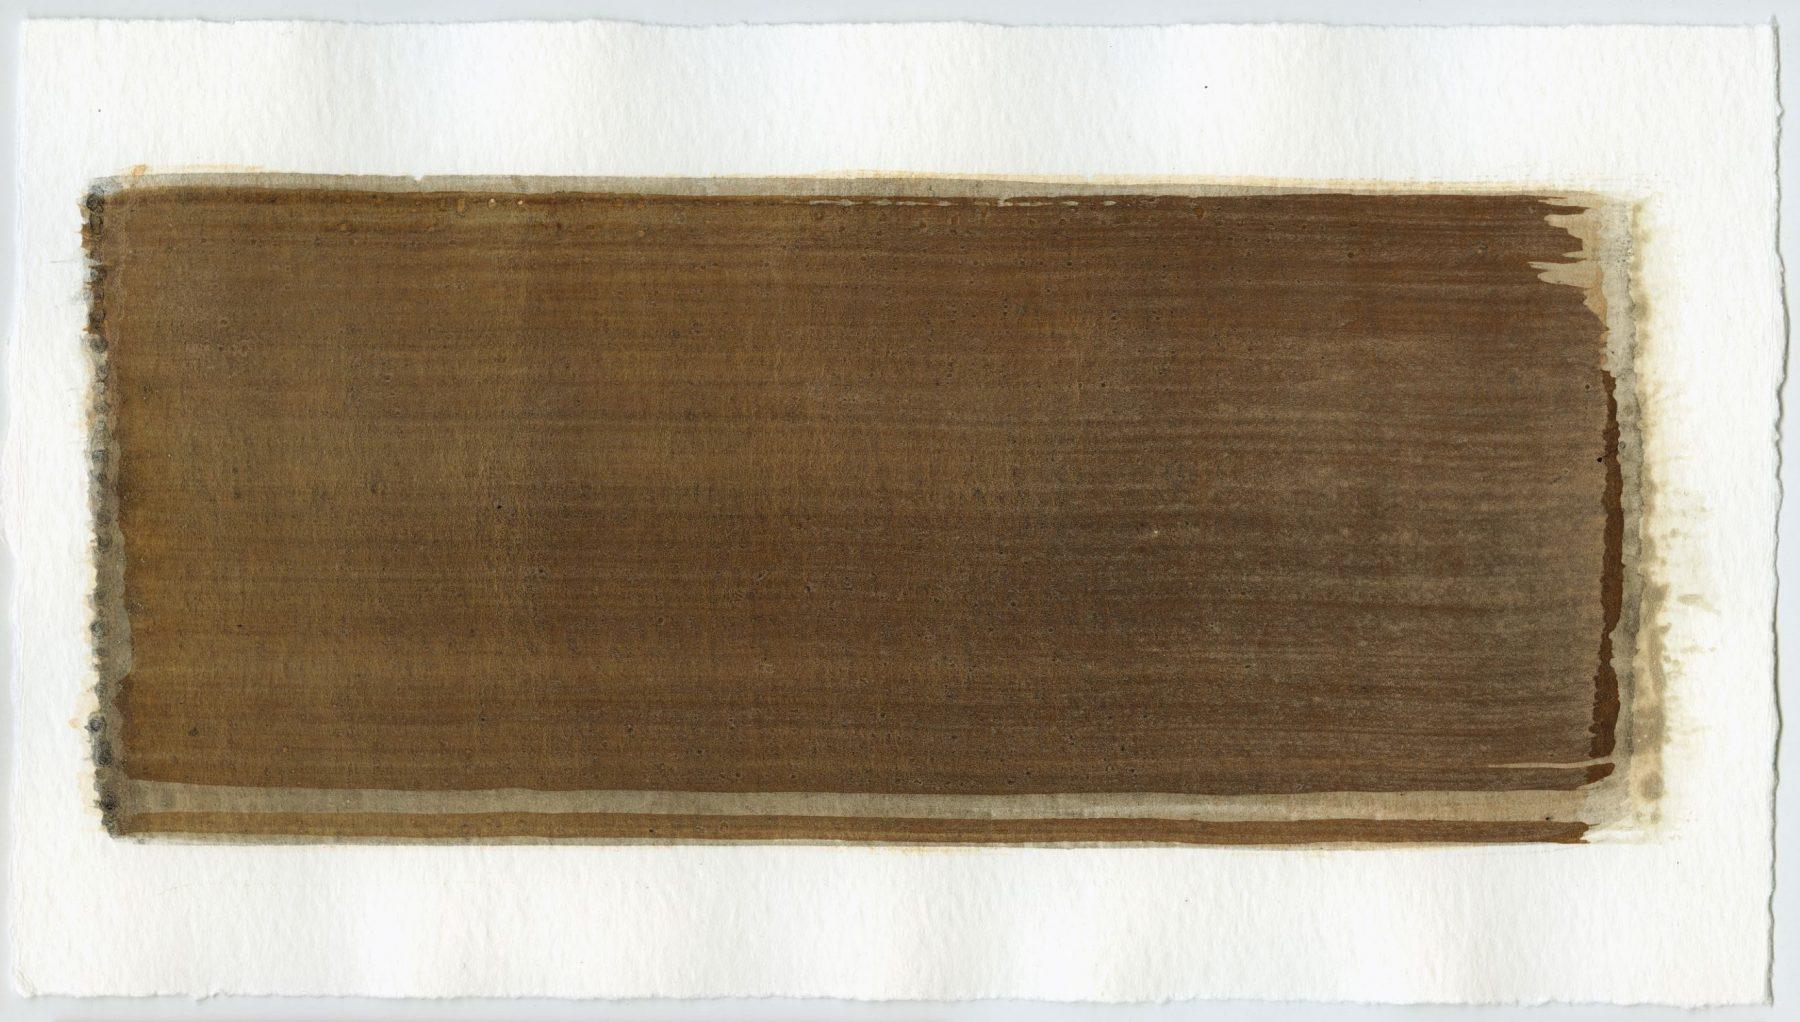 Brush stroke no. 41 - Selfmade pigment: Perekker grijs gebrand, Slingerpad zwart, IJzeroer, Perekker roze